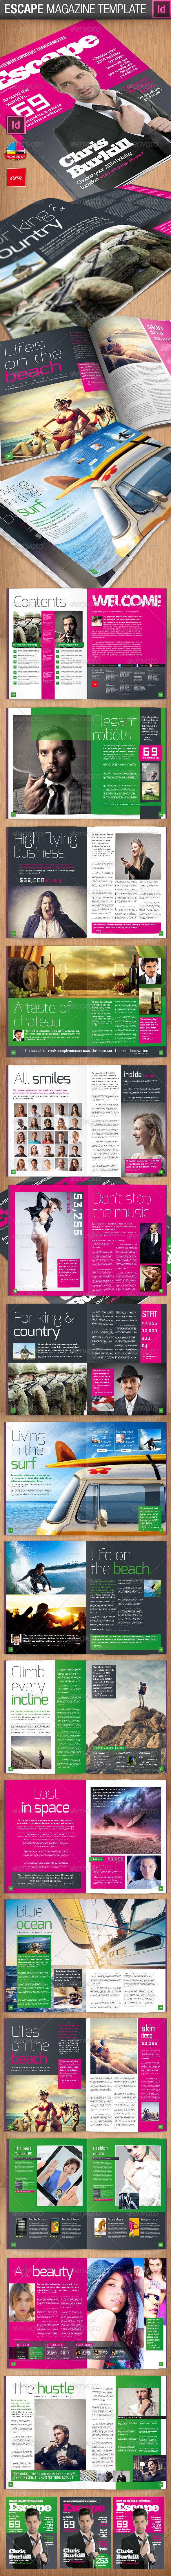 Escape Magazine Template - Magazines Print Templates